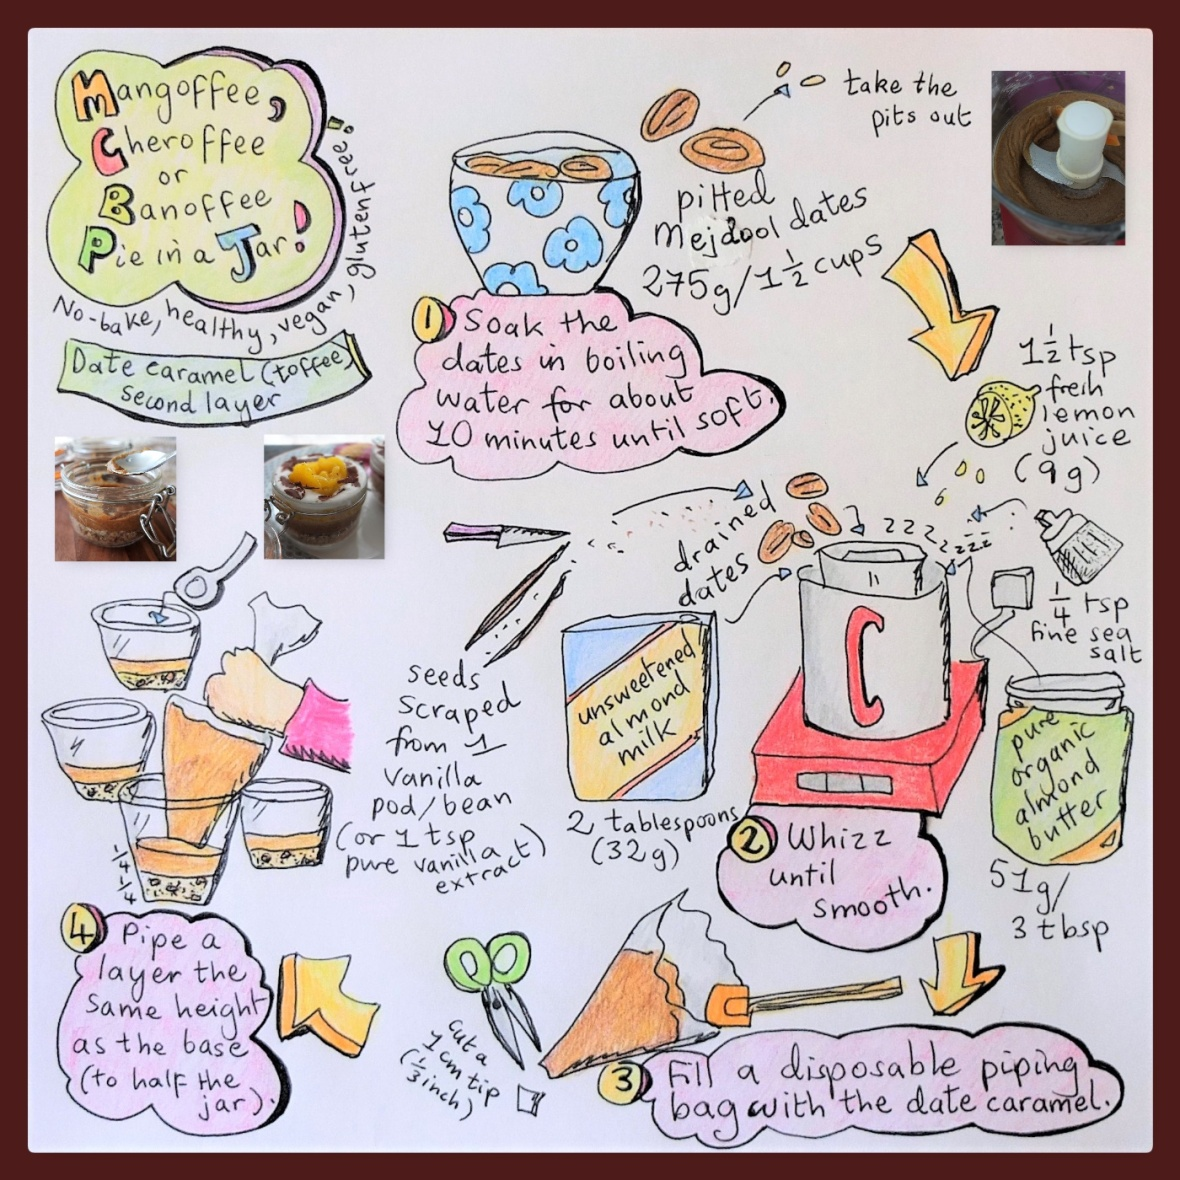 Mangoffee, Cheroffee, Banoffee pie in a jar - date caramel illustrated recipe